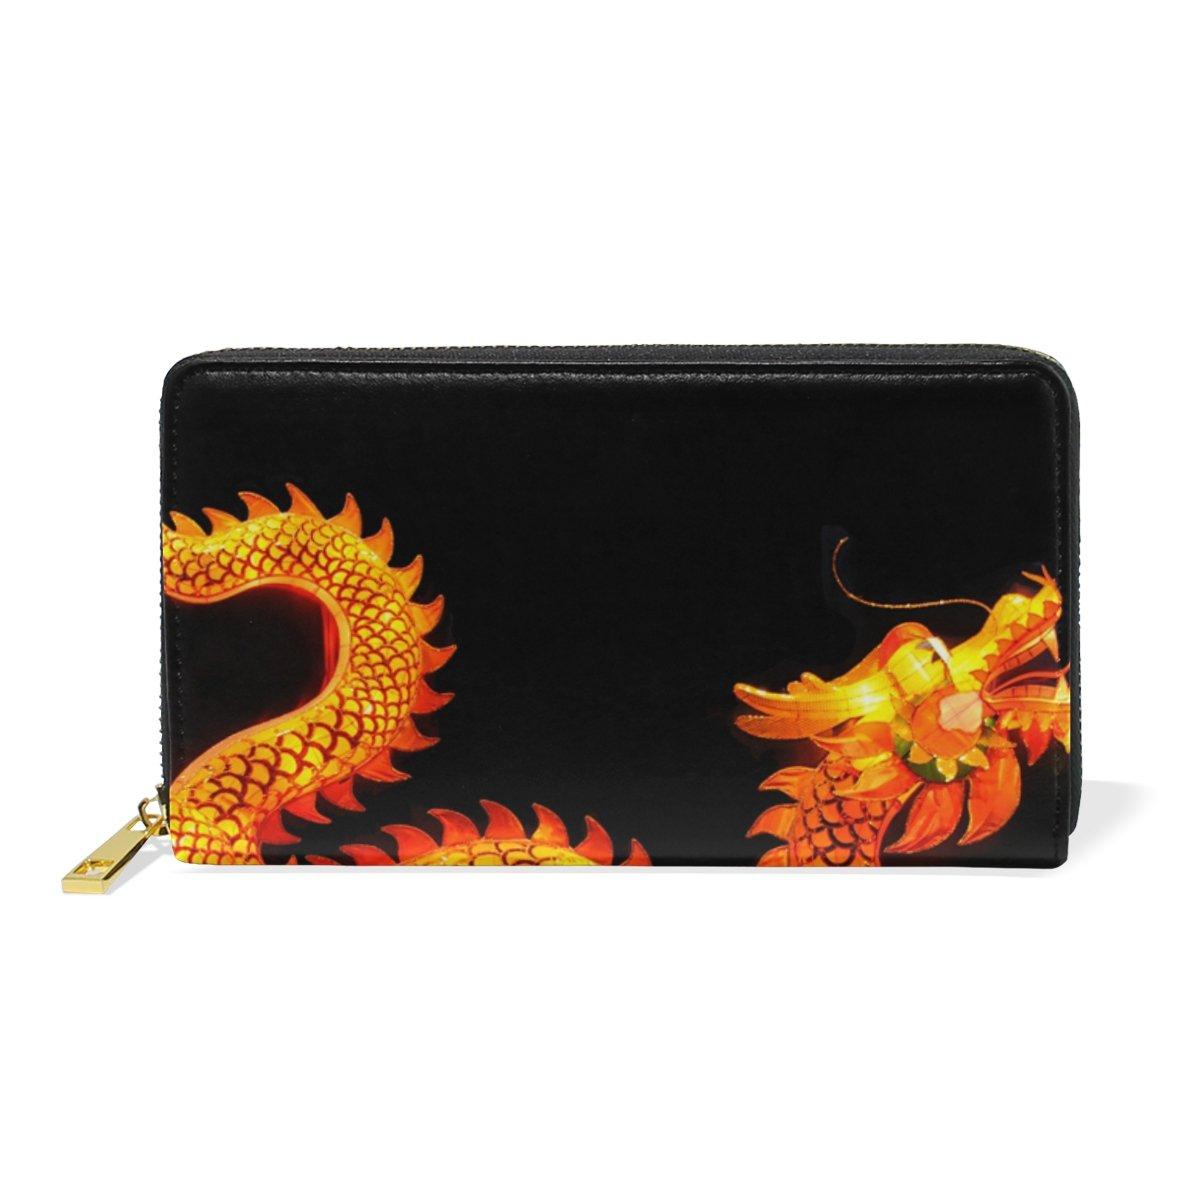 COOSUN China Leather Linterna del dragón del monedero del ...